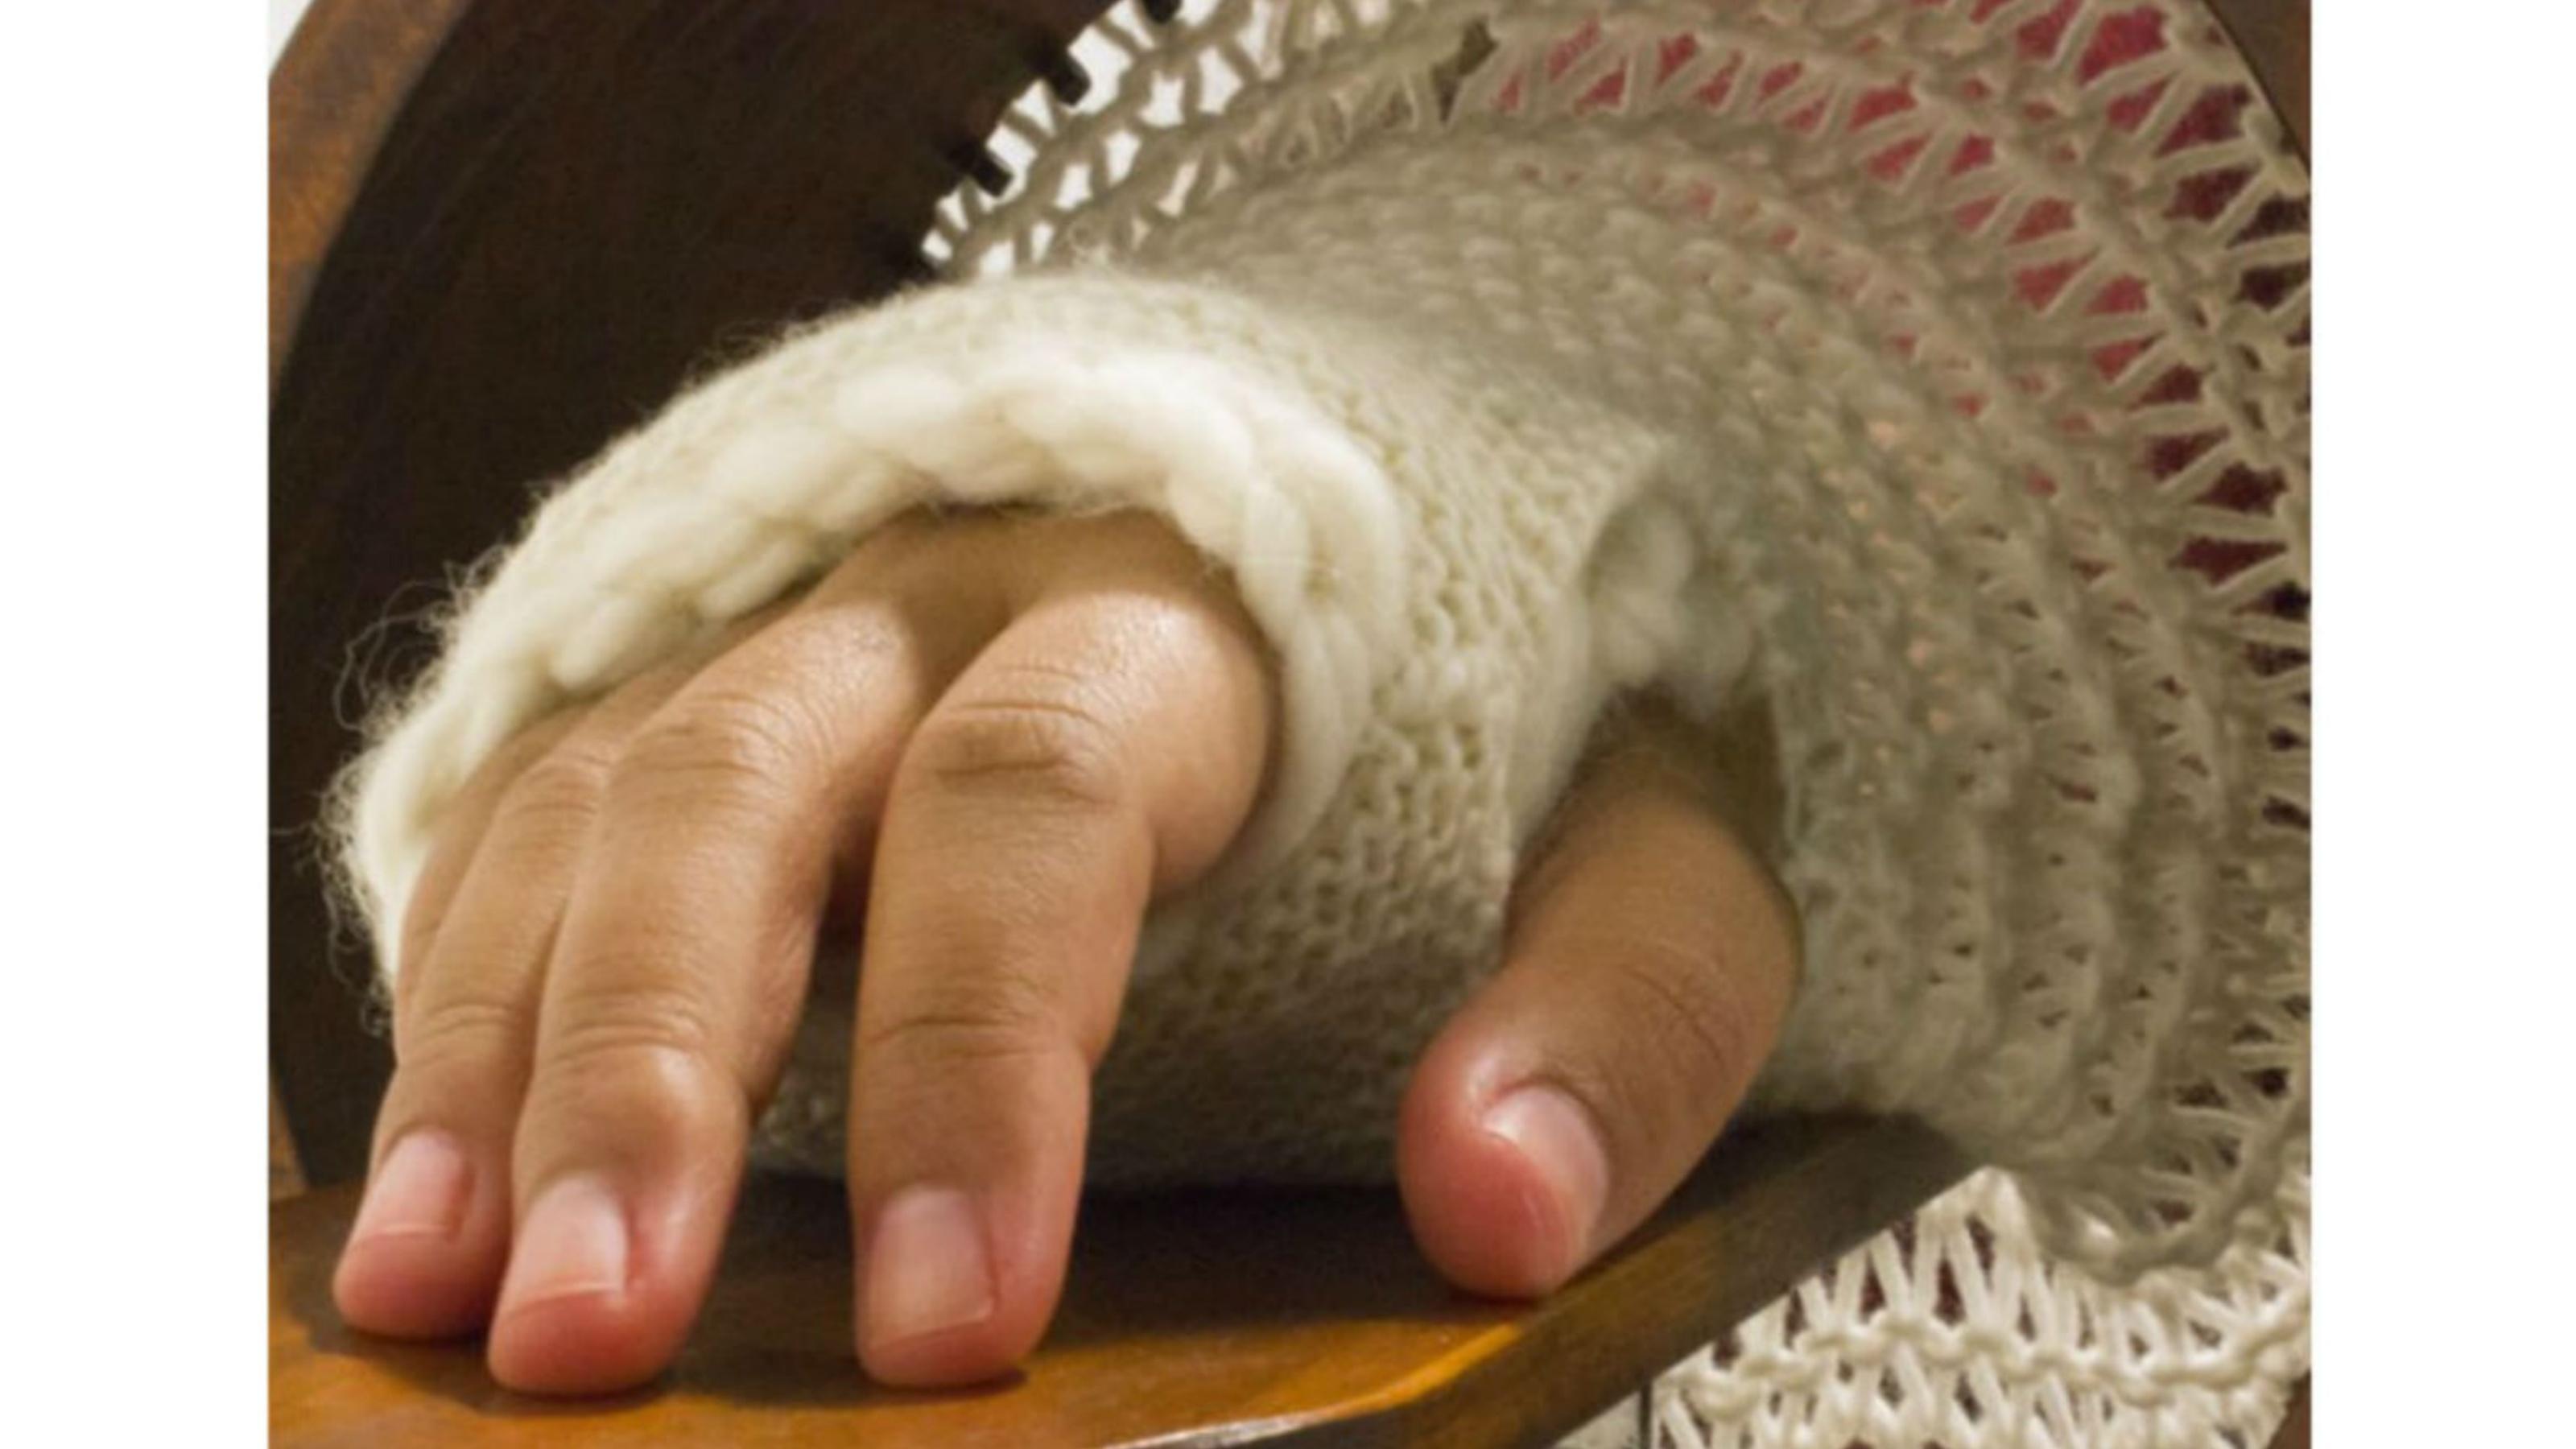 Hand in woven glove